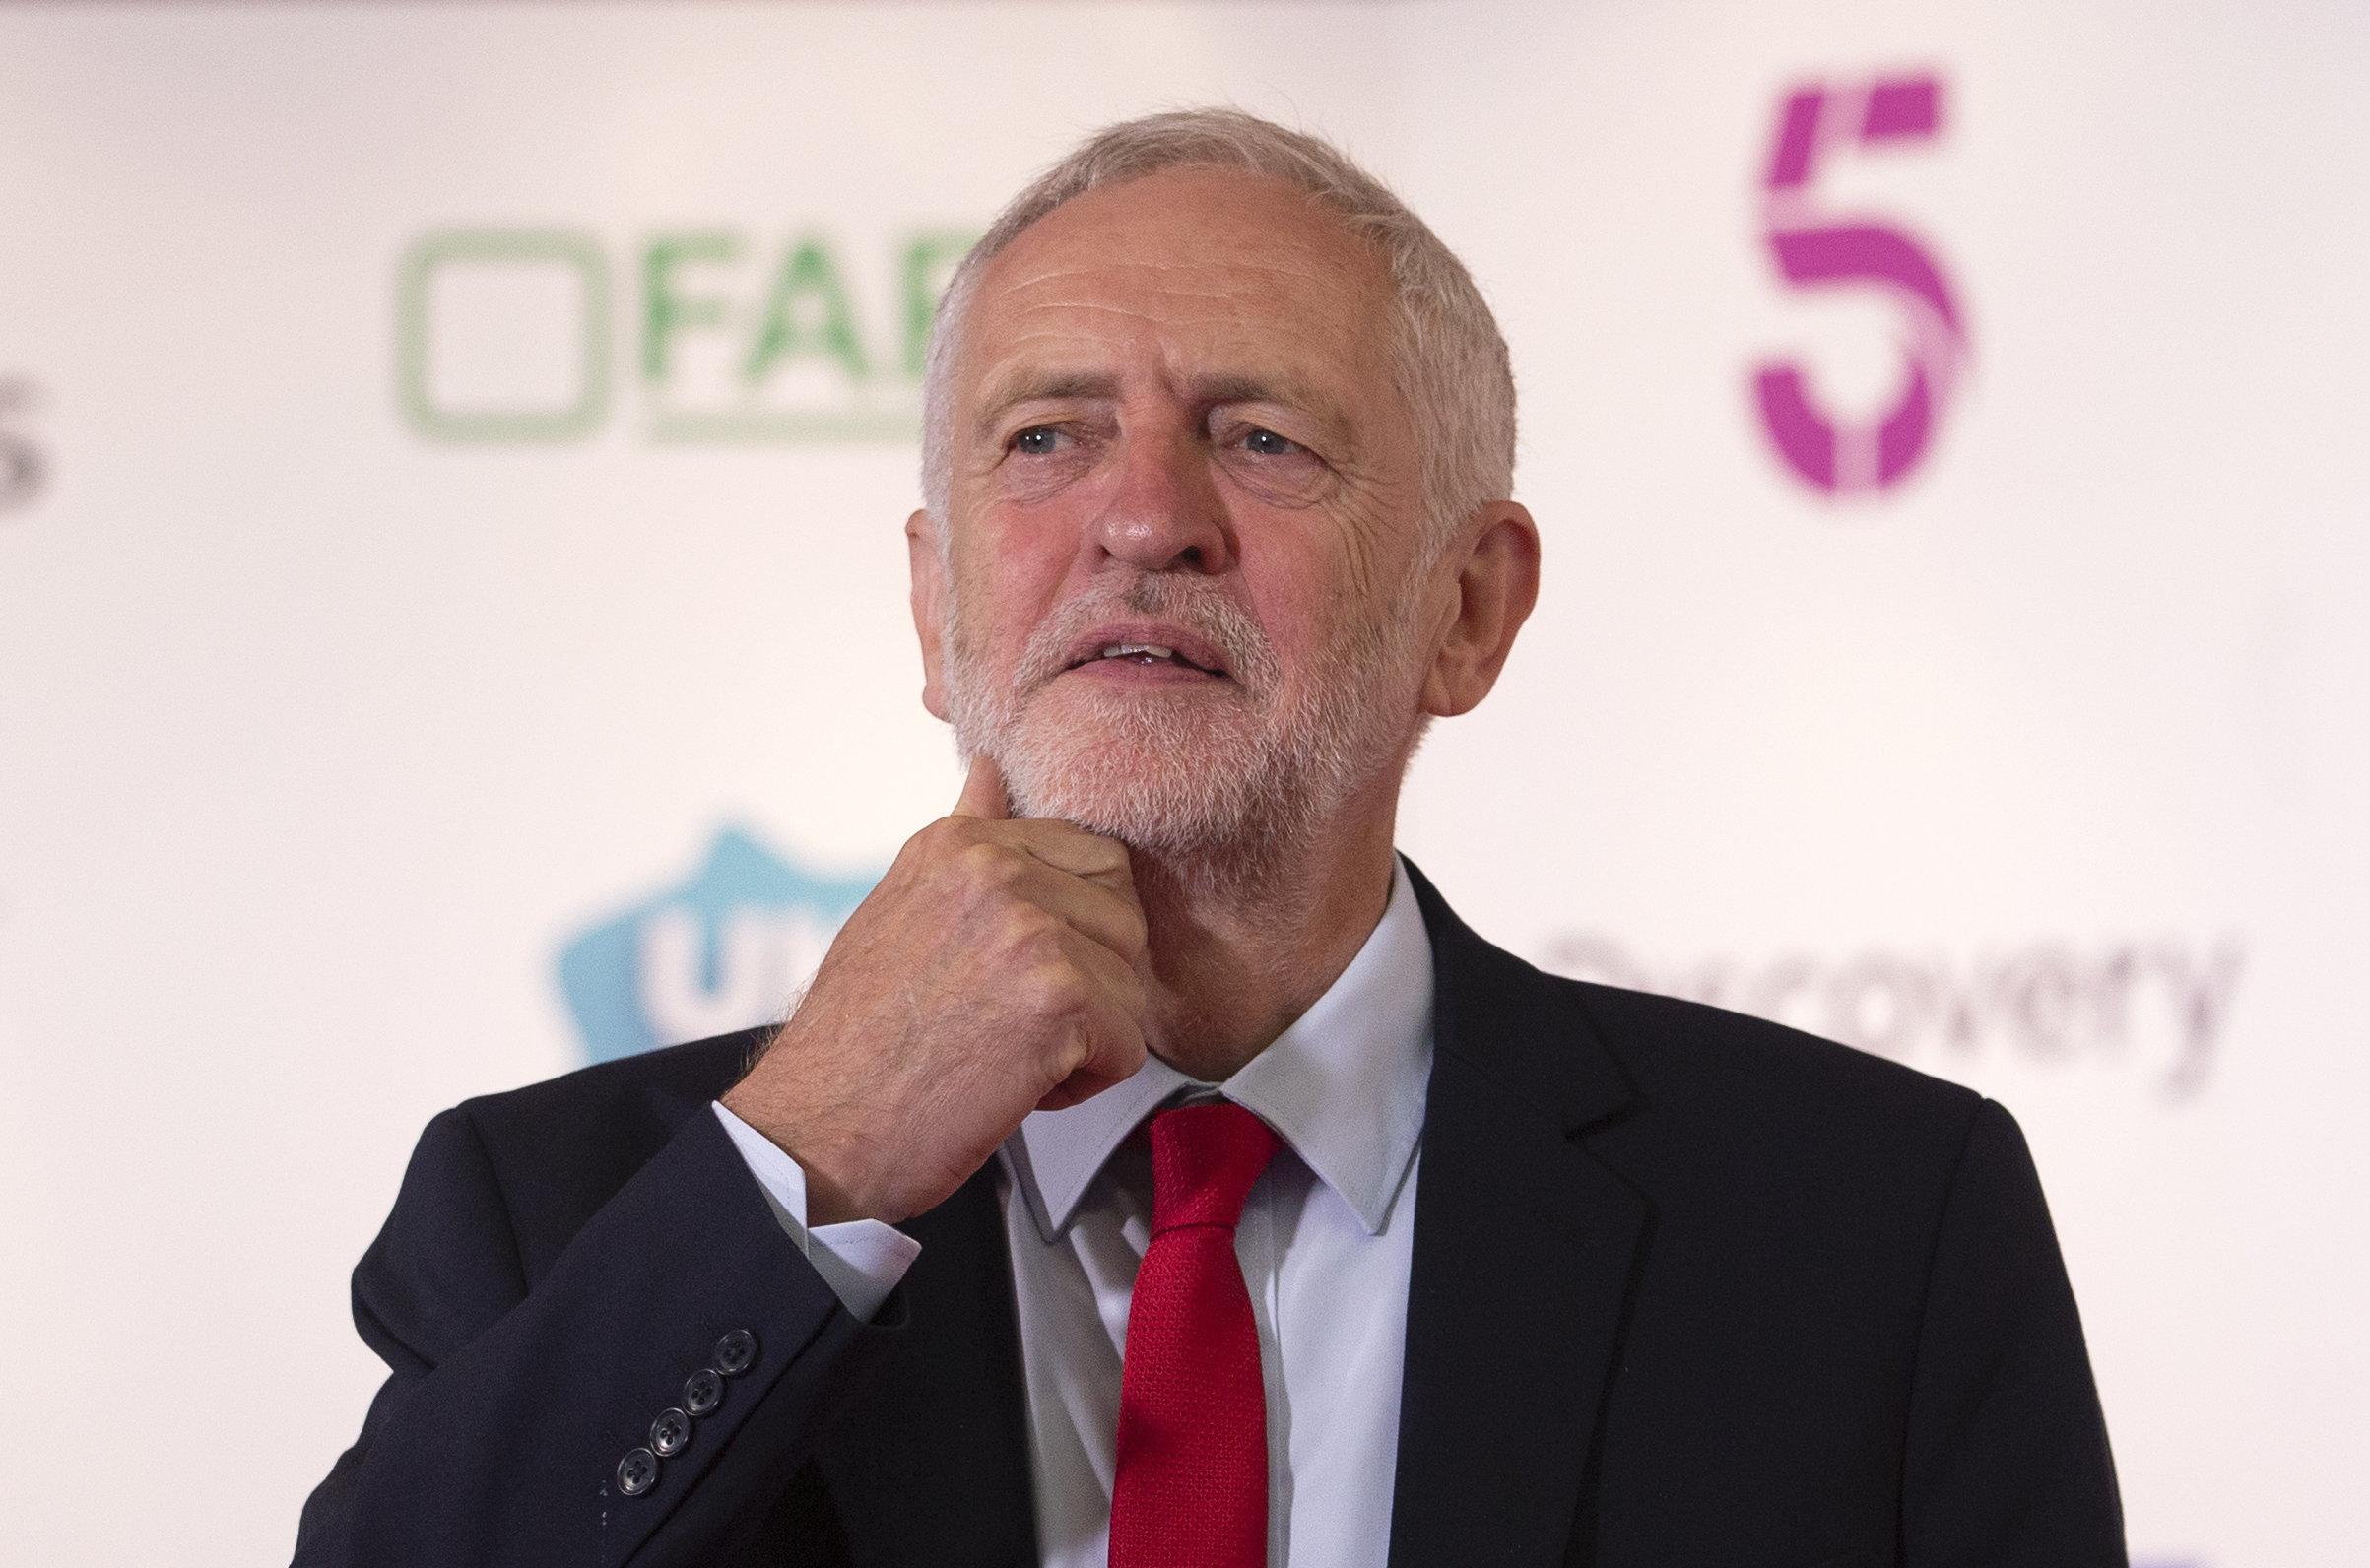 Labour Activist Bid To Debate Radical Motion On Extending Free Movement At